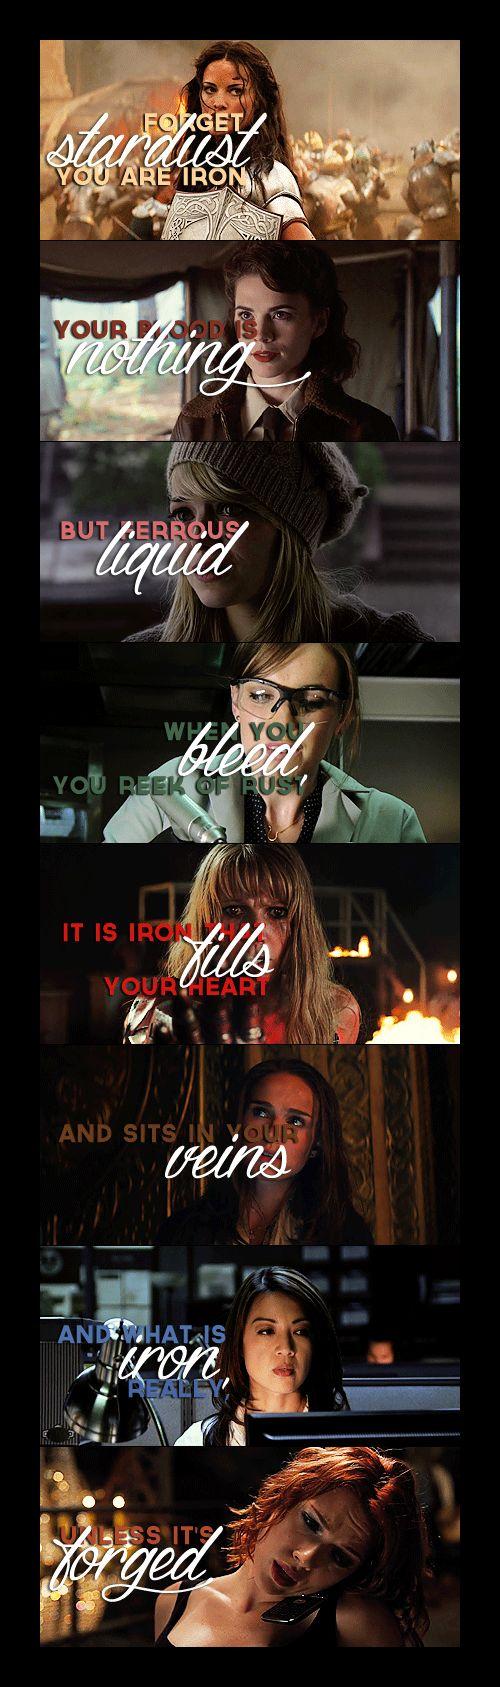 The Women of Marvel are Iron: Sif, Peggy, Gwen, Jemma, Pepper, Jane, Melinda & Natasha.